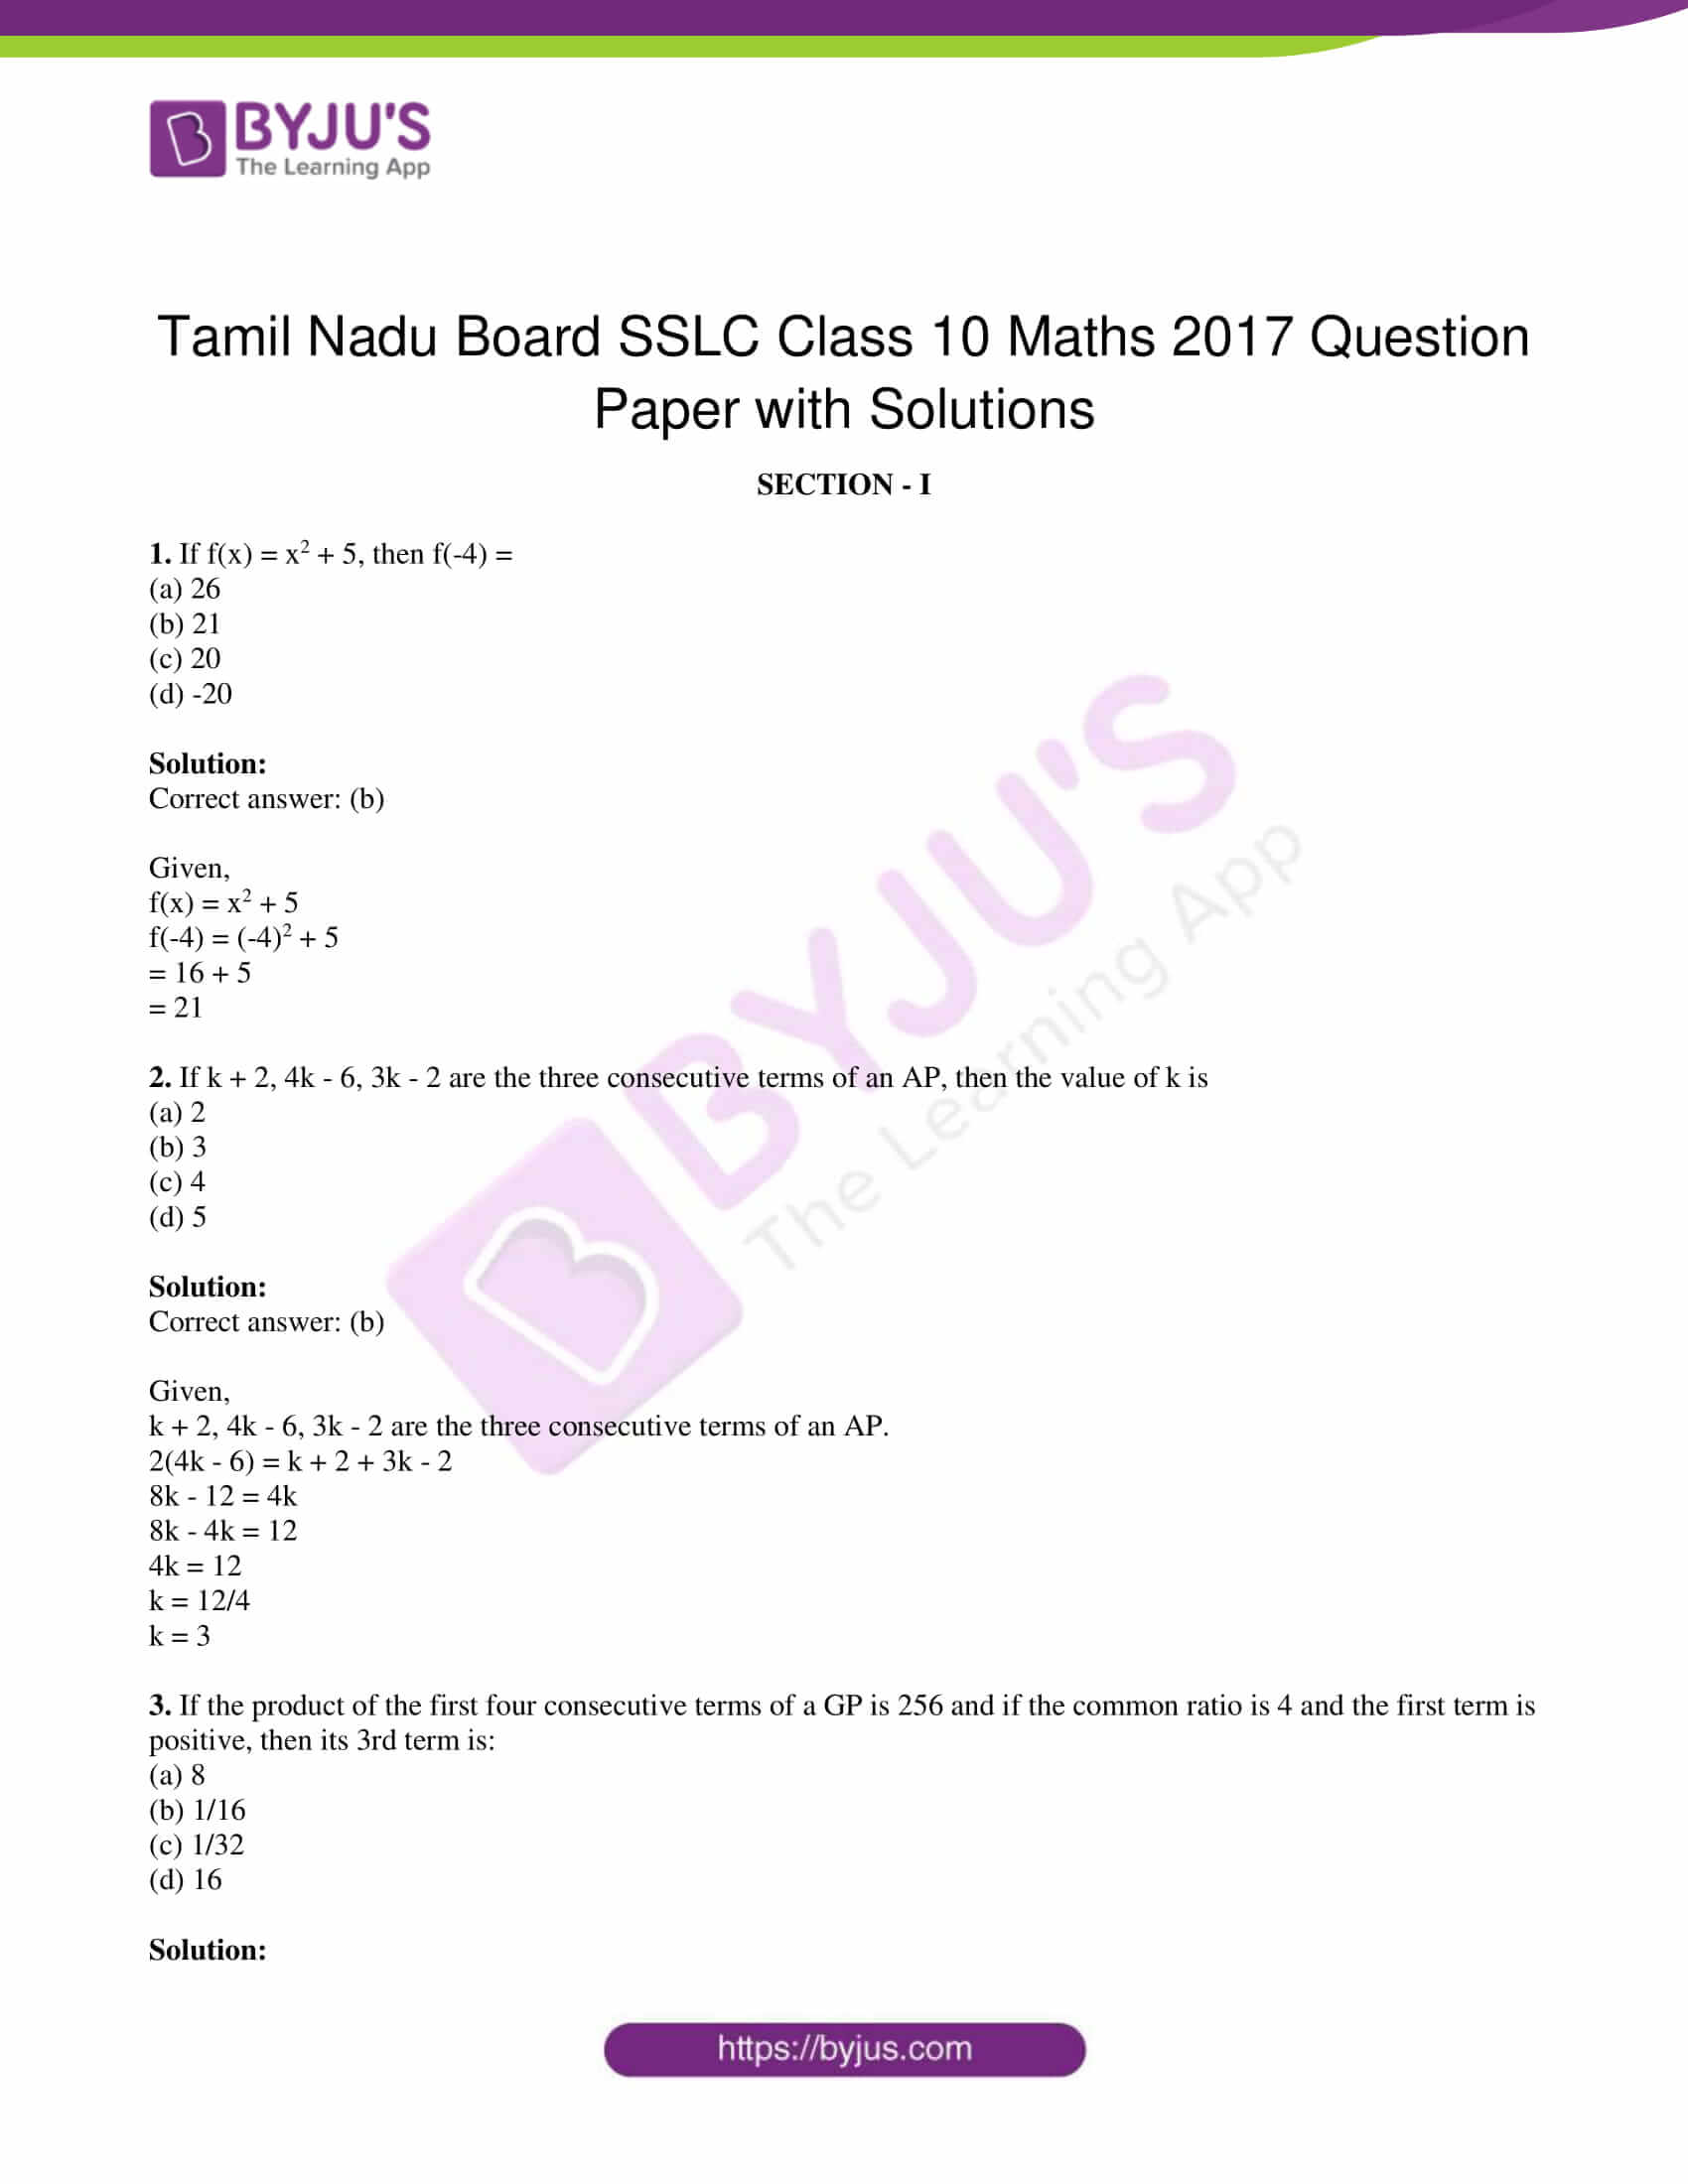 tn board sslc class 10 maths 2017 solutions 01